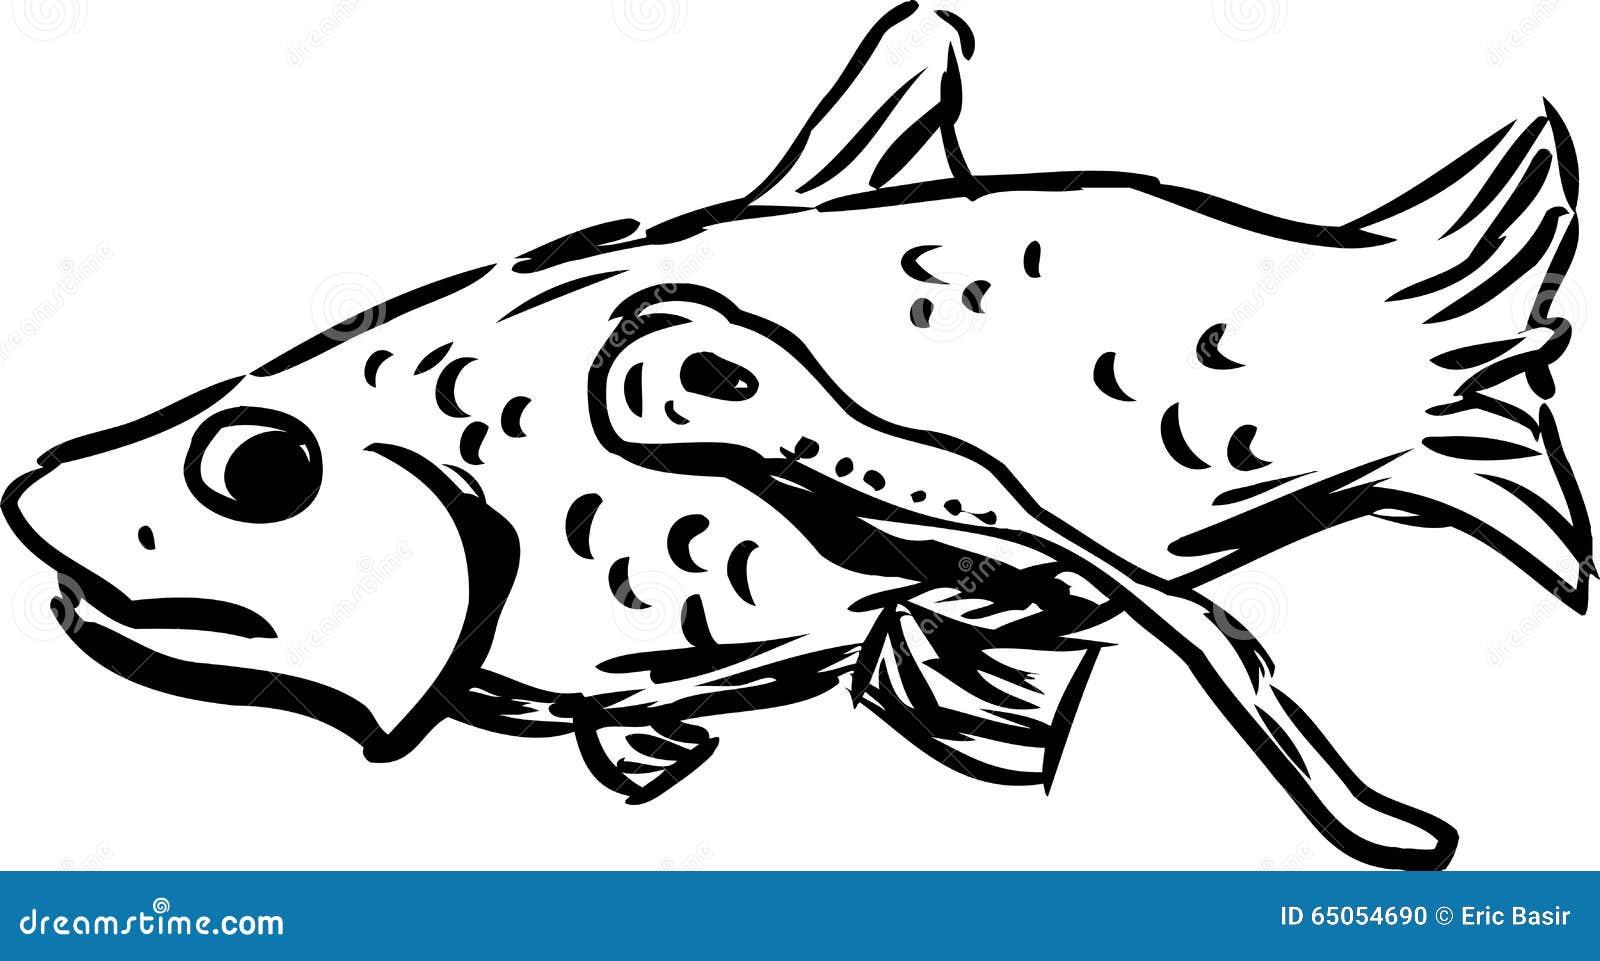 Outline Of Lamprey Eating A Fish Stock Illustration Illustration